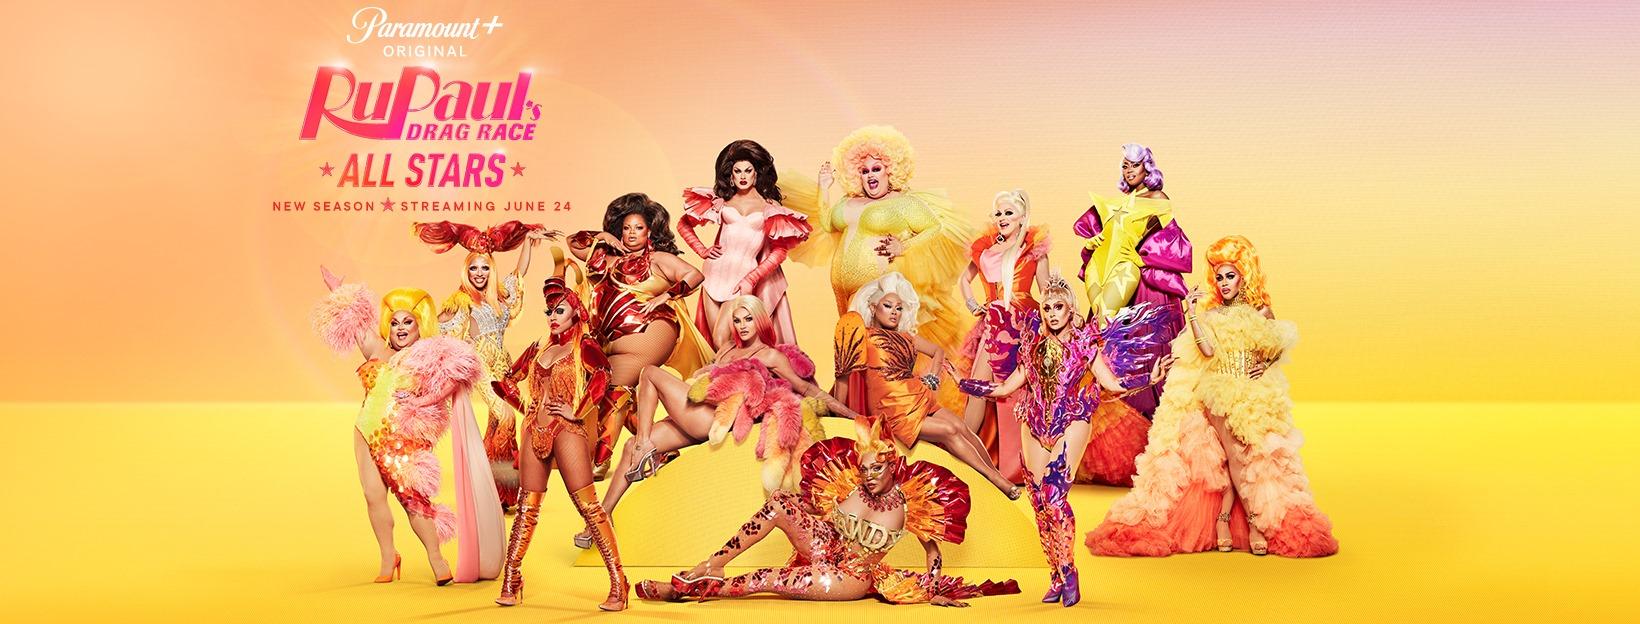 RuPaul's Drag Race All Stars: Season 6